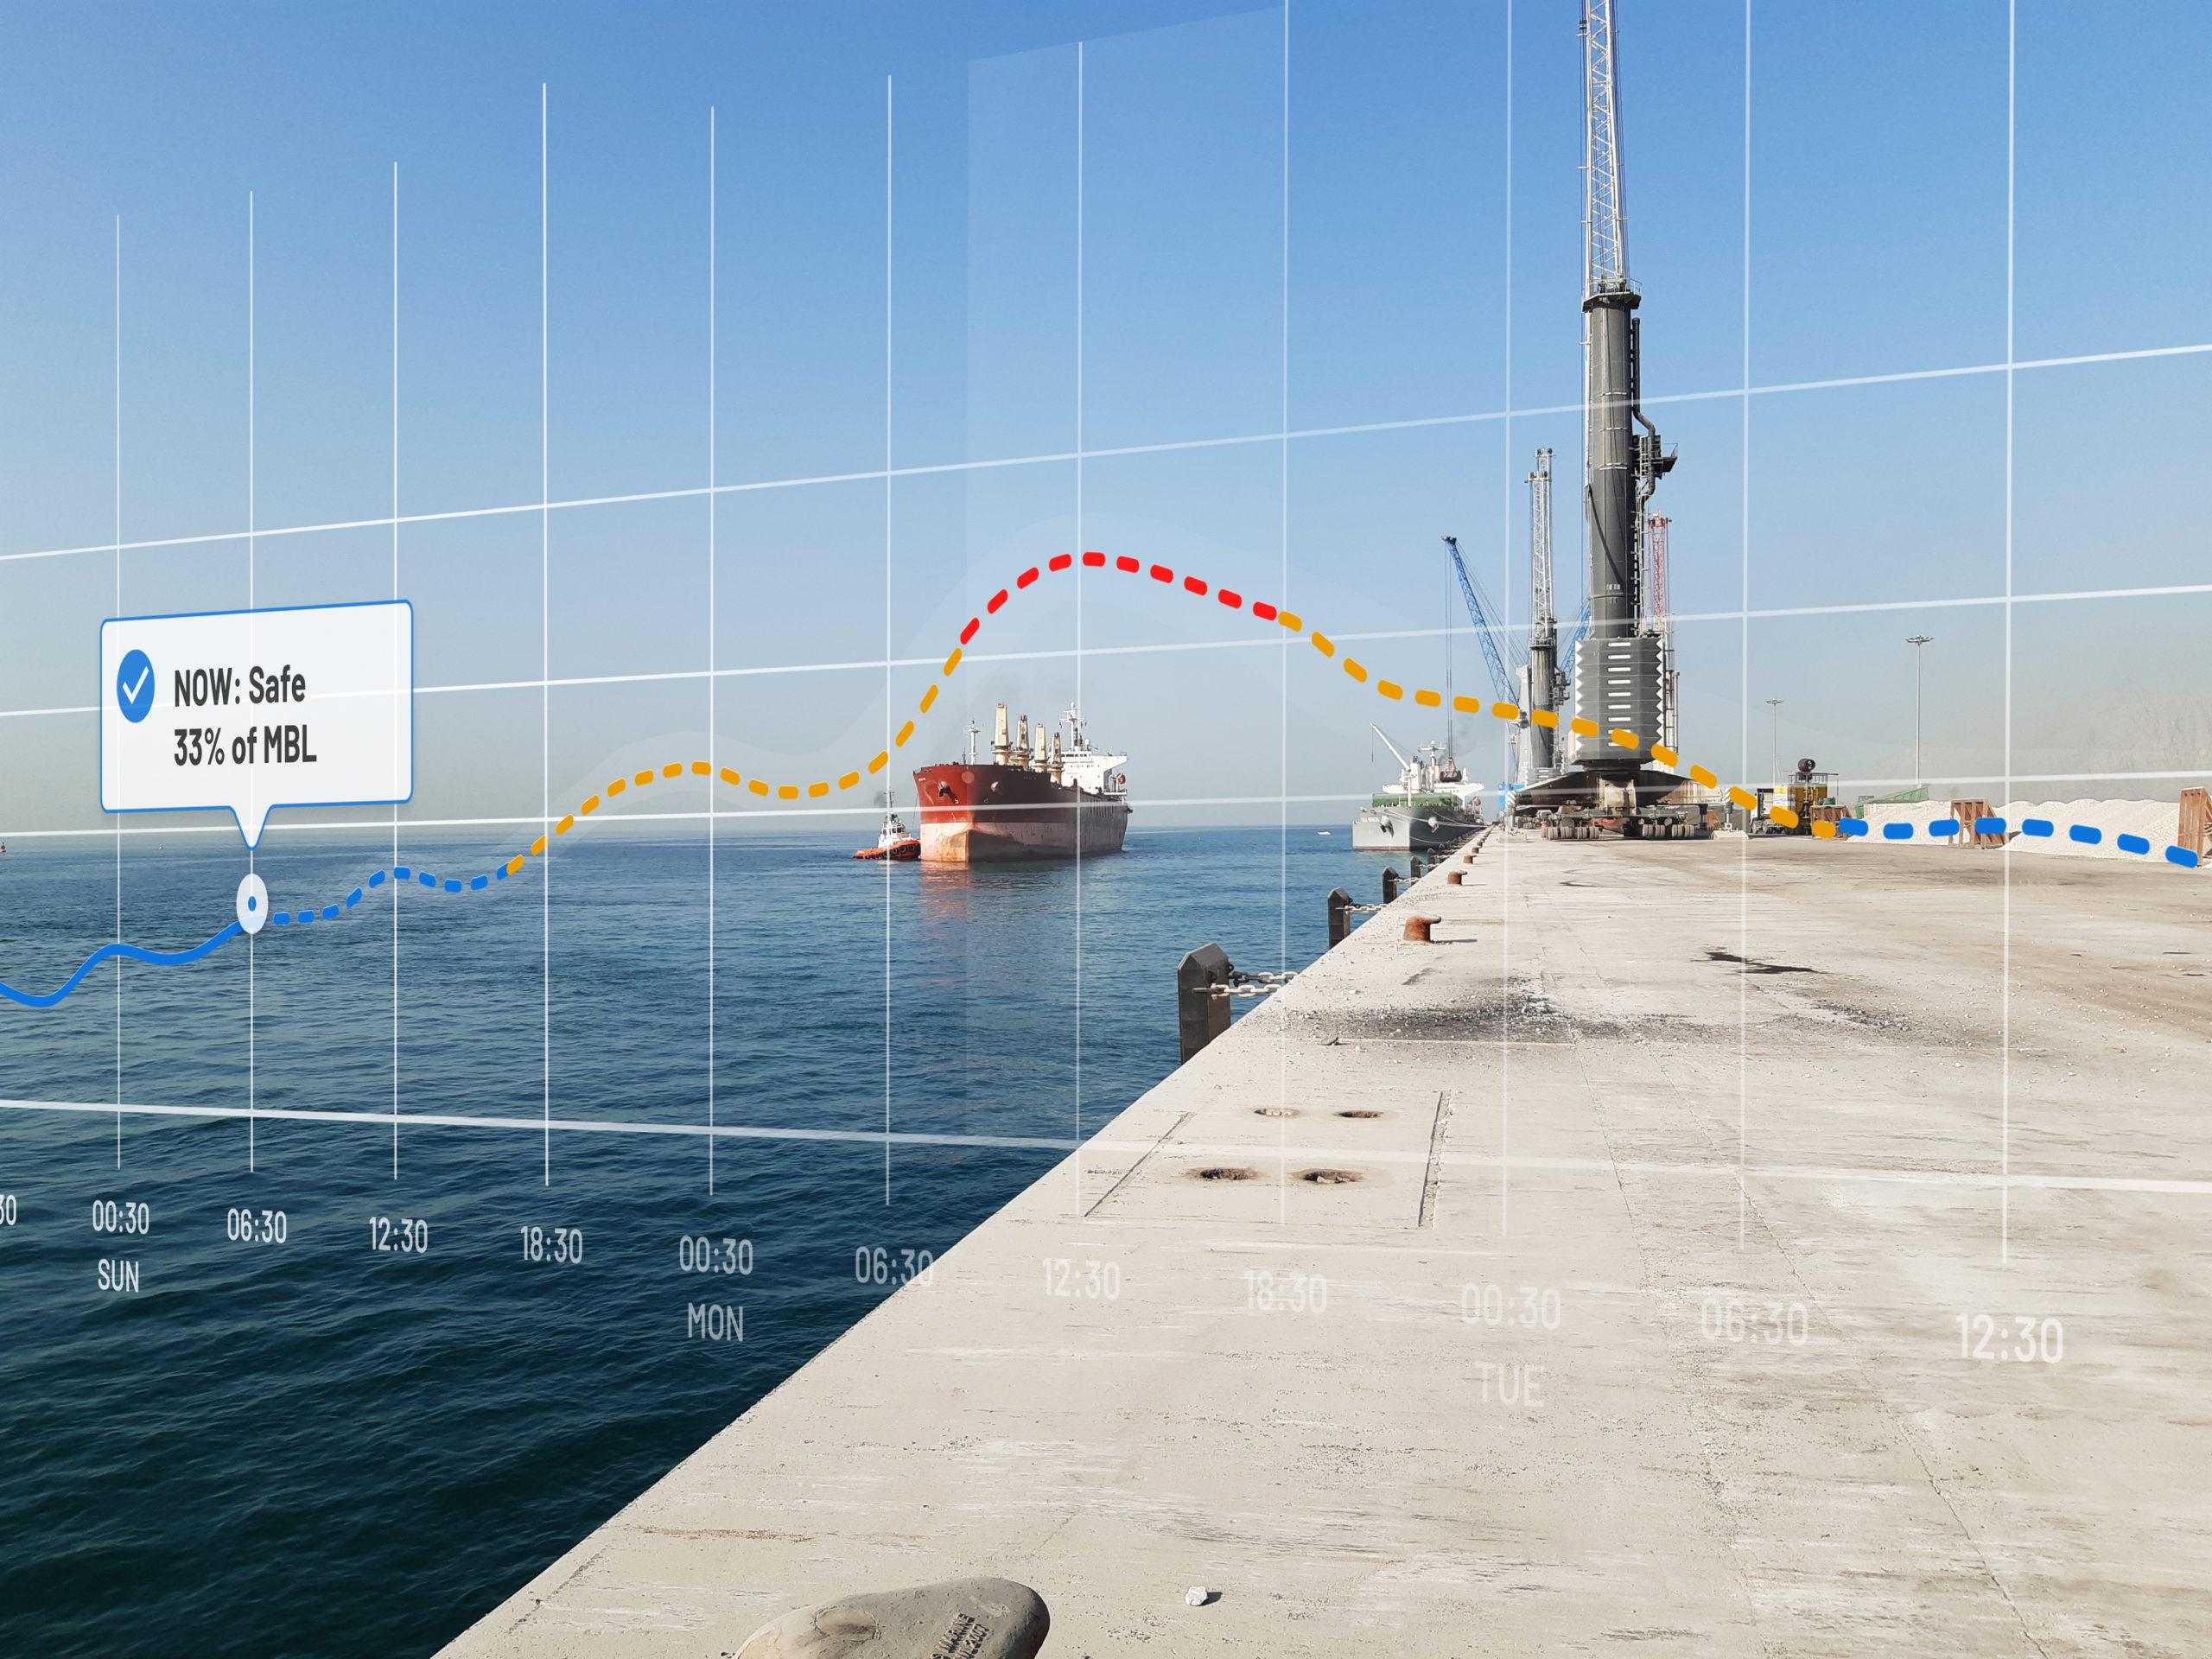 RAK ports safe lines